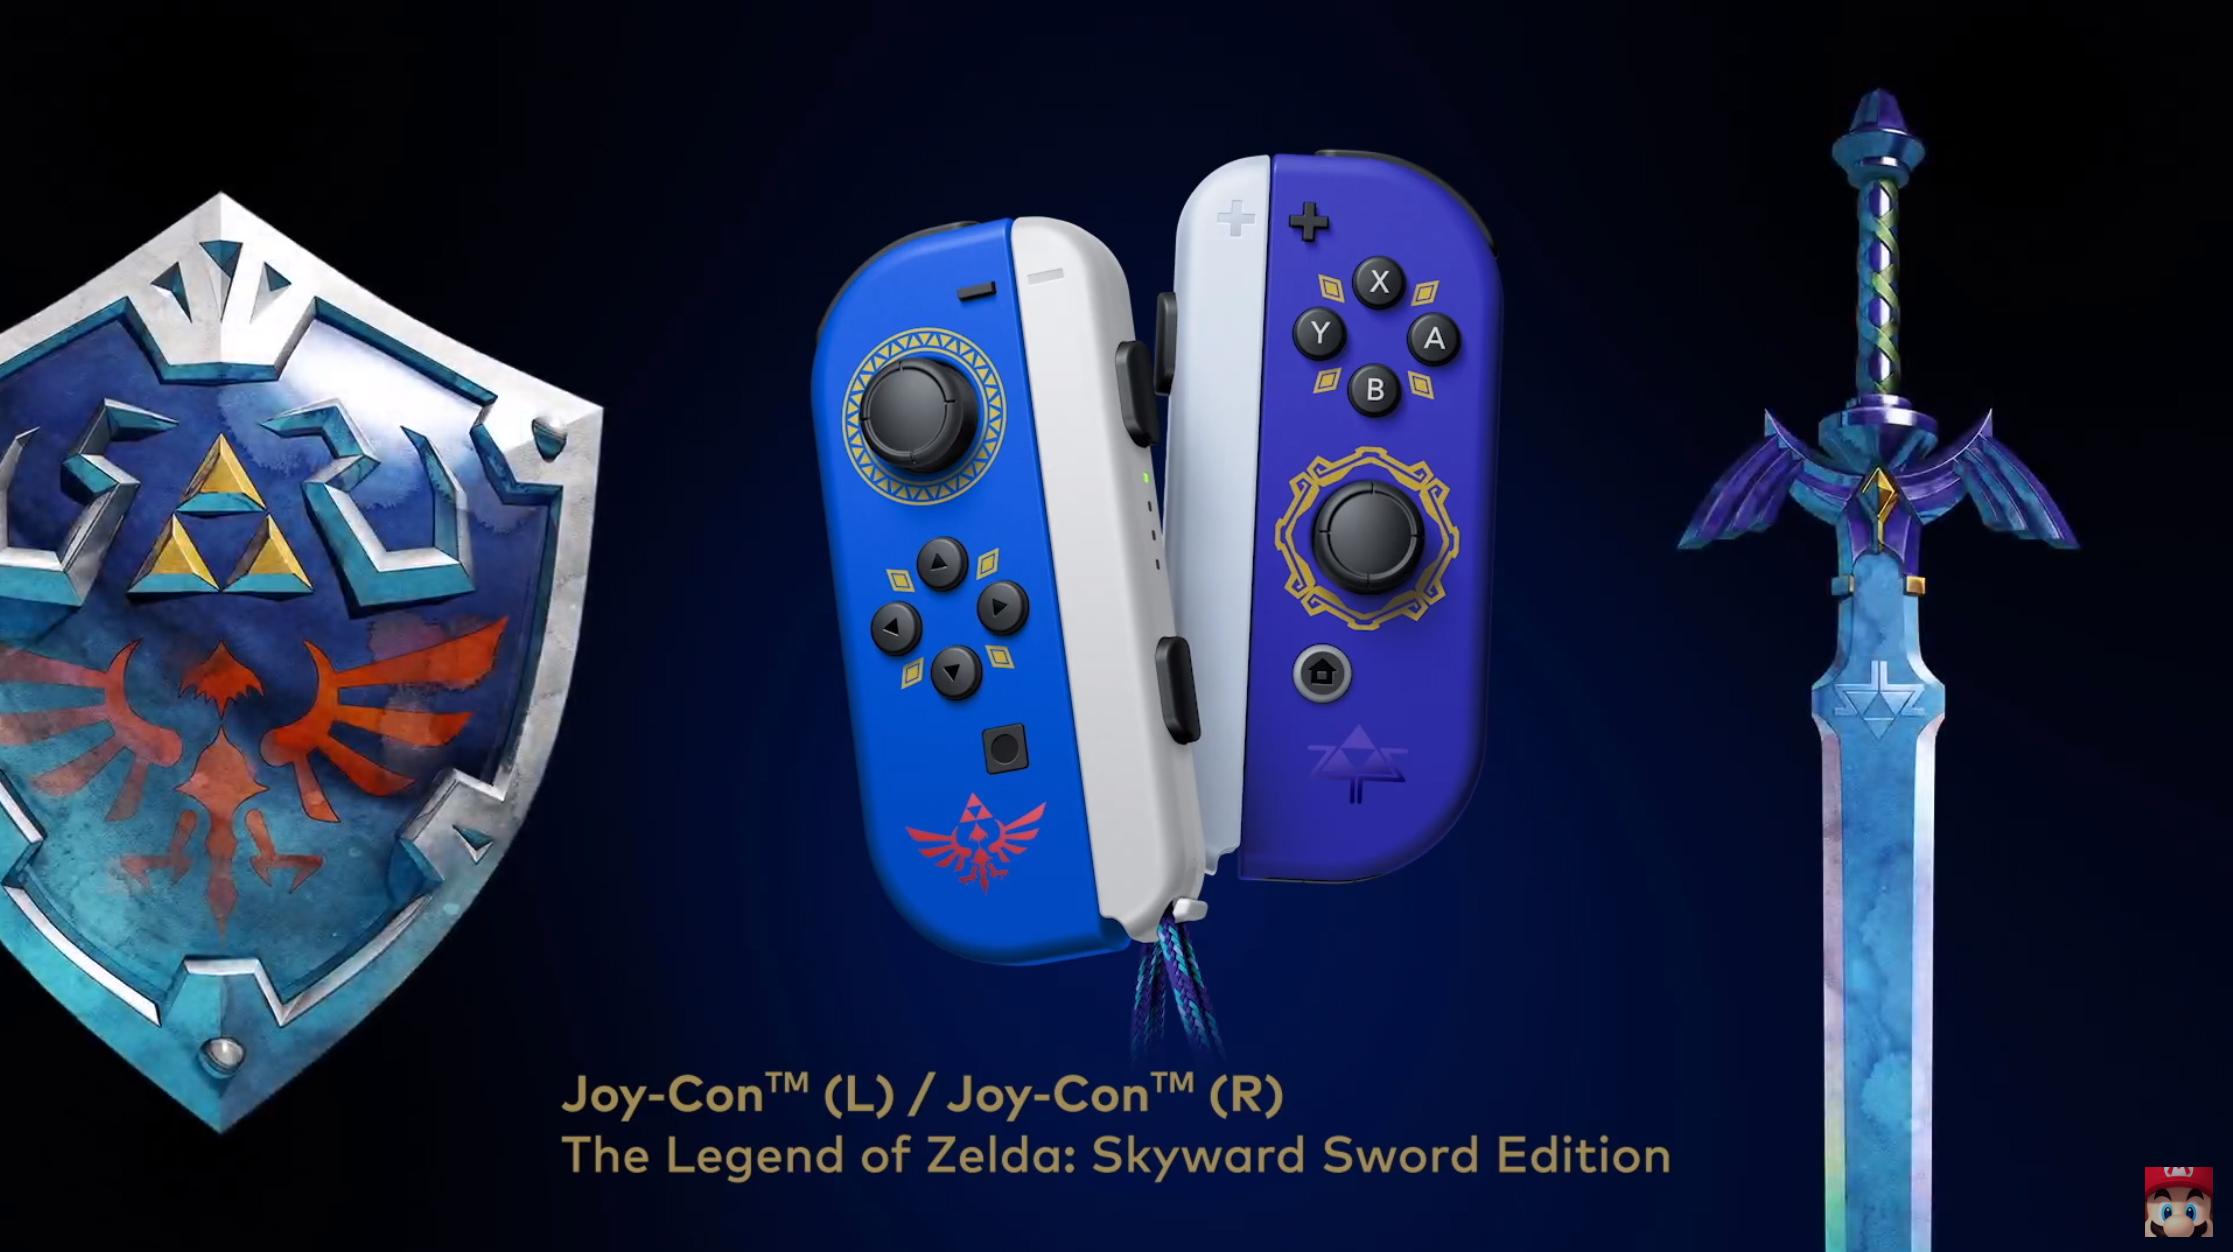 The Legend of Zelda: Skyward Sword gets remastered for Switch nd8